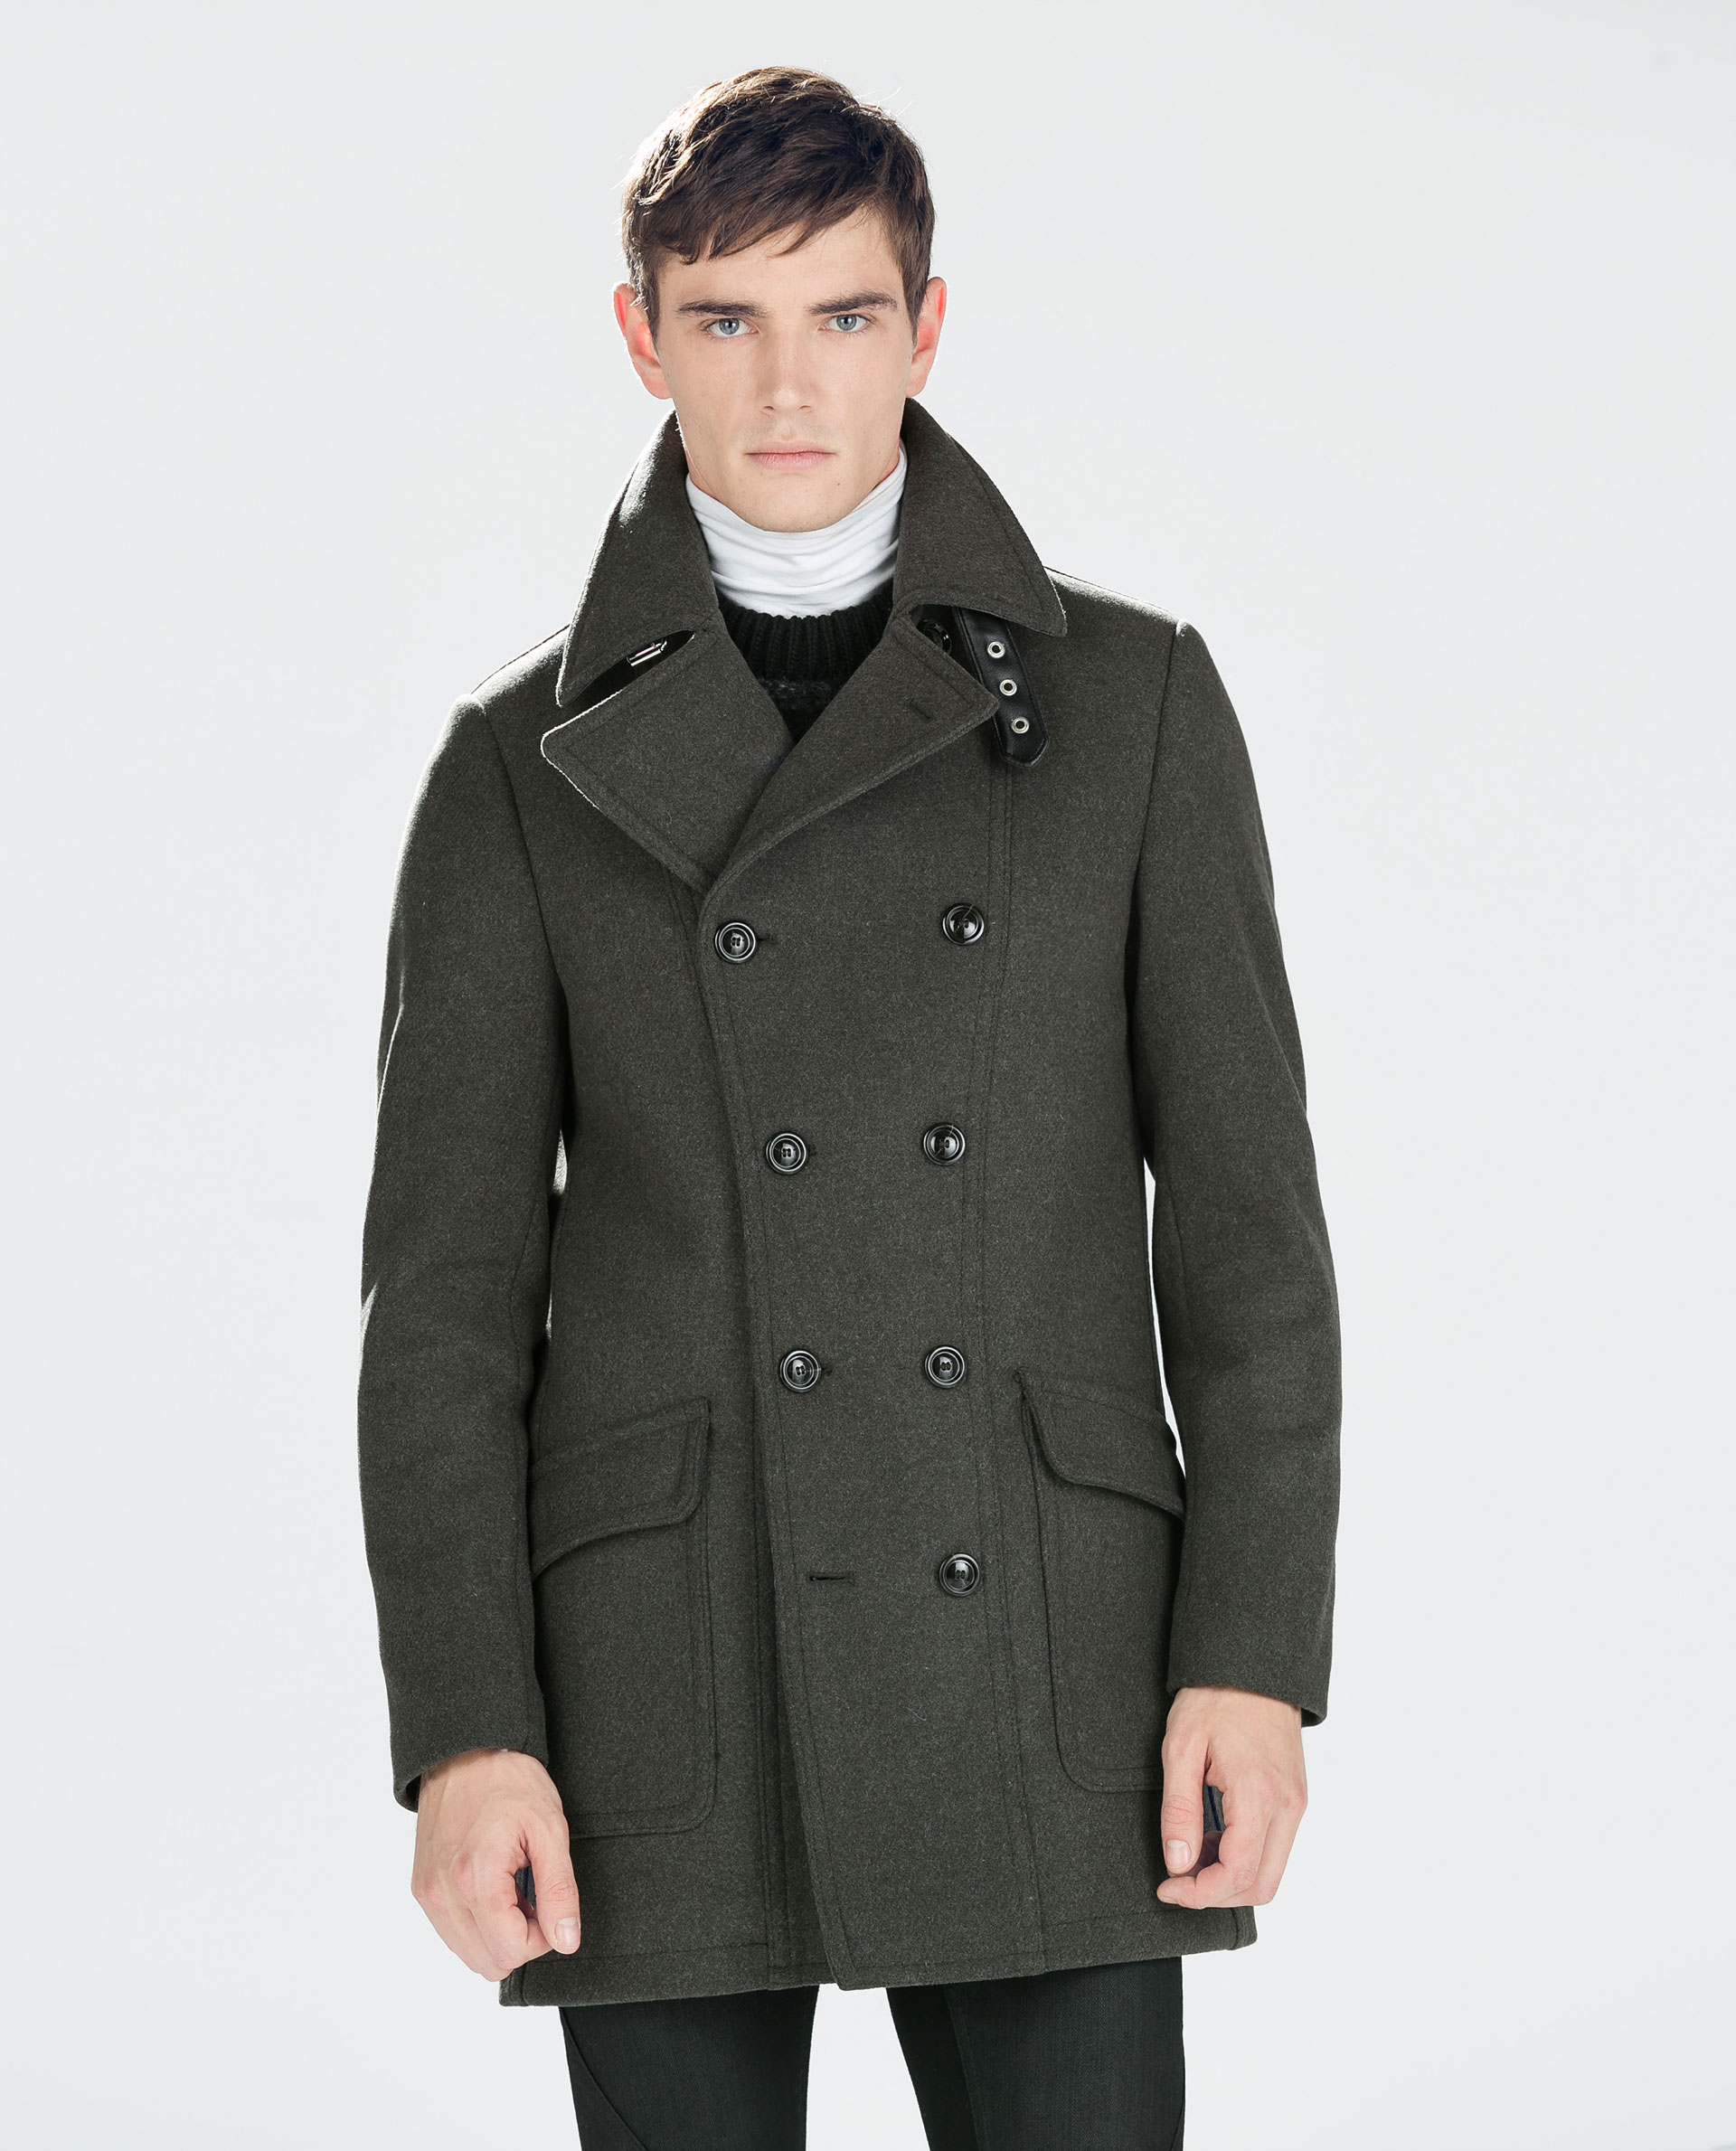 Mens Double Breasted Coat Fashion Women S Coat 2017